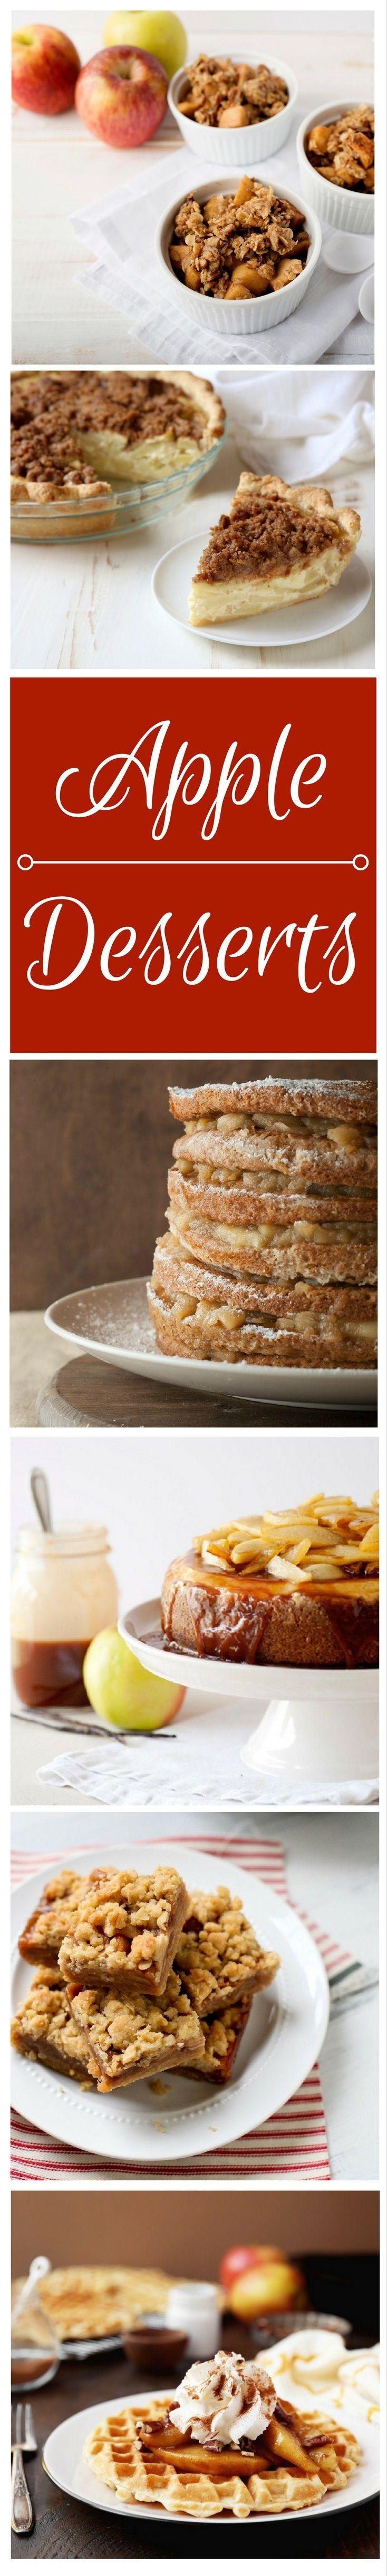 Best Apple Desserts  17 Best images about Dessert Recipes on Pinterest